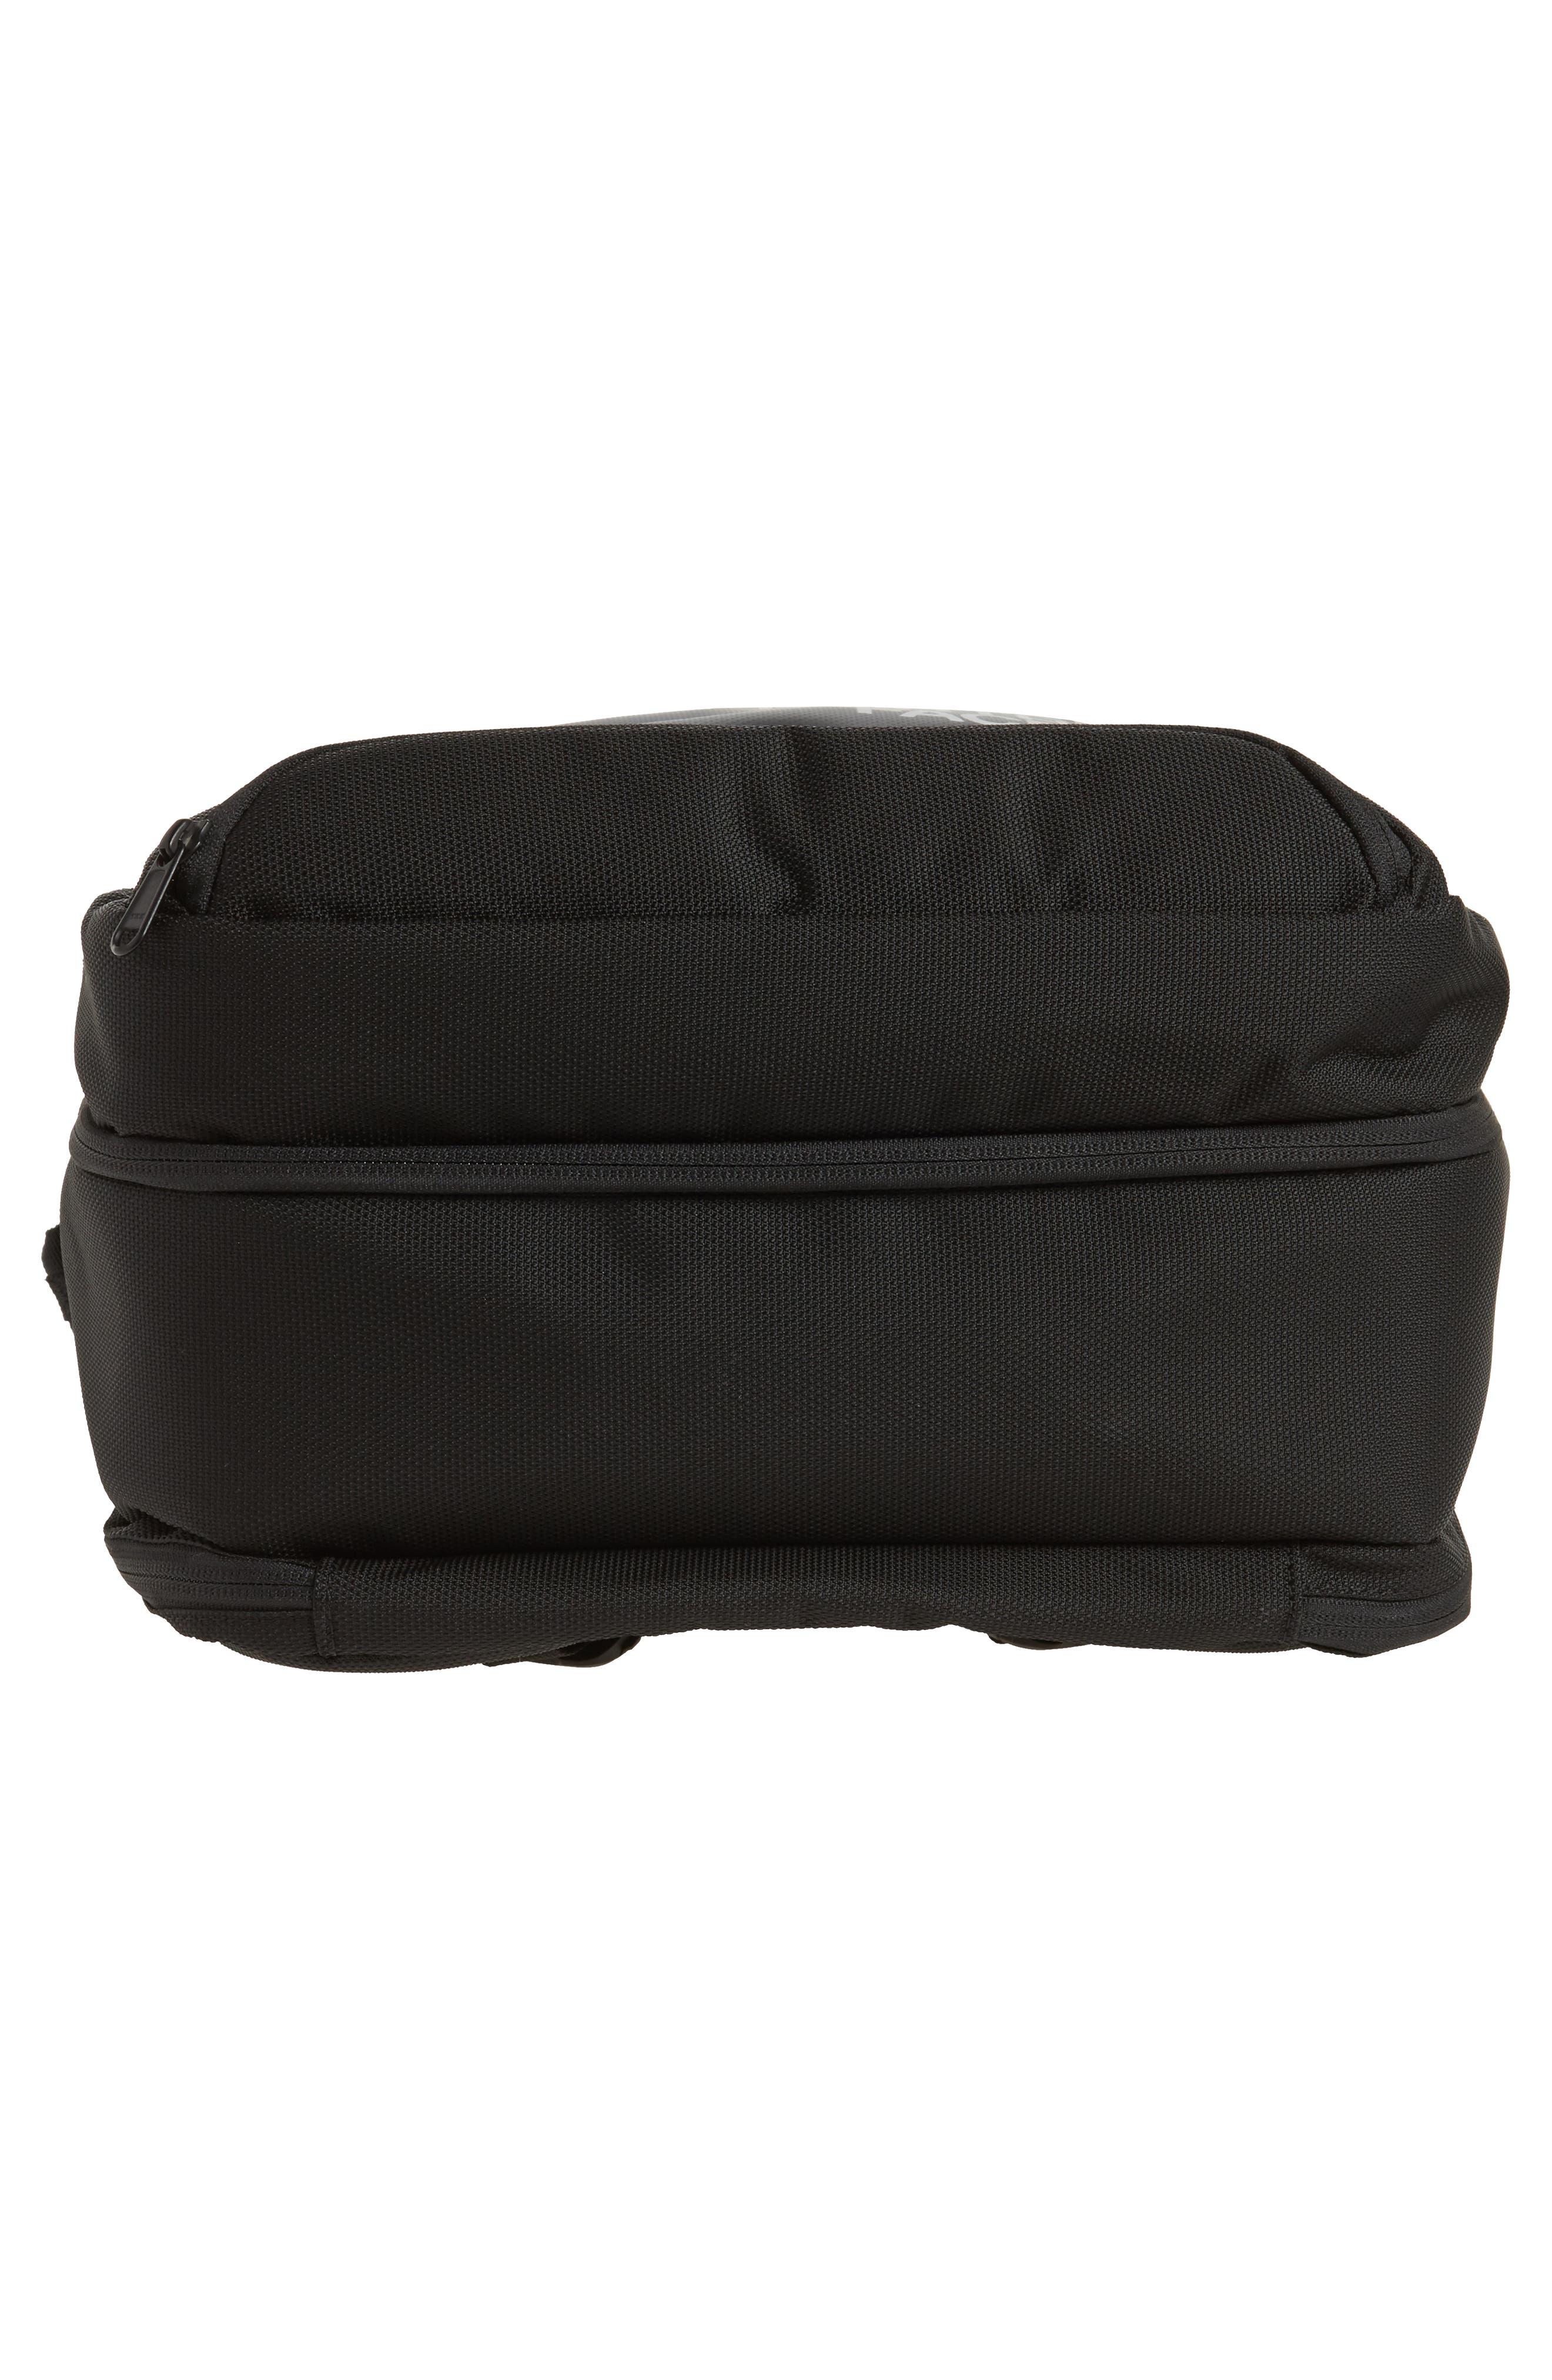 Refractor Duffel Backpack,                             Alternate thumbnail 6, color,                             001